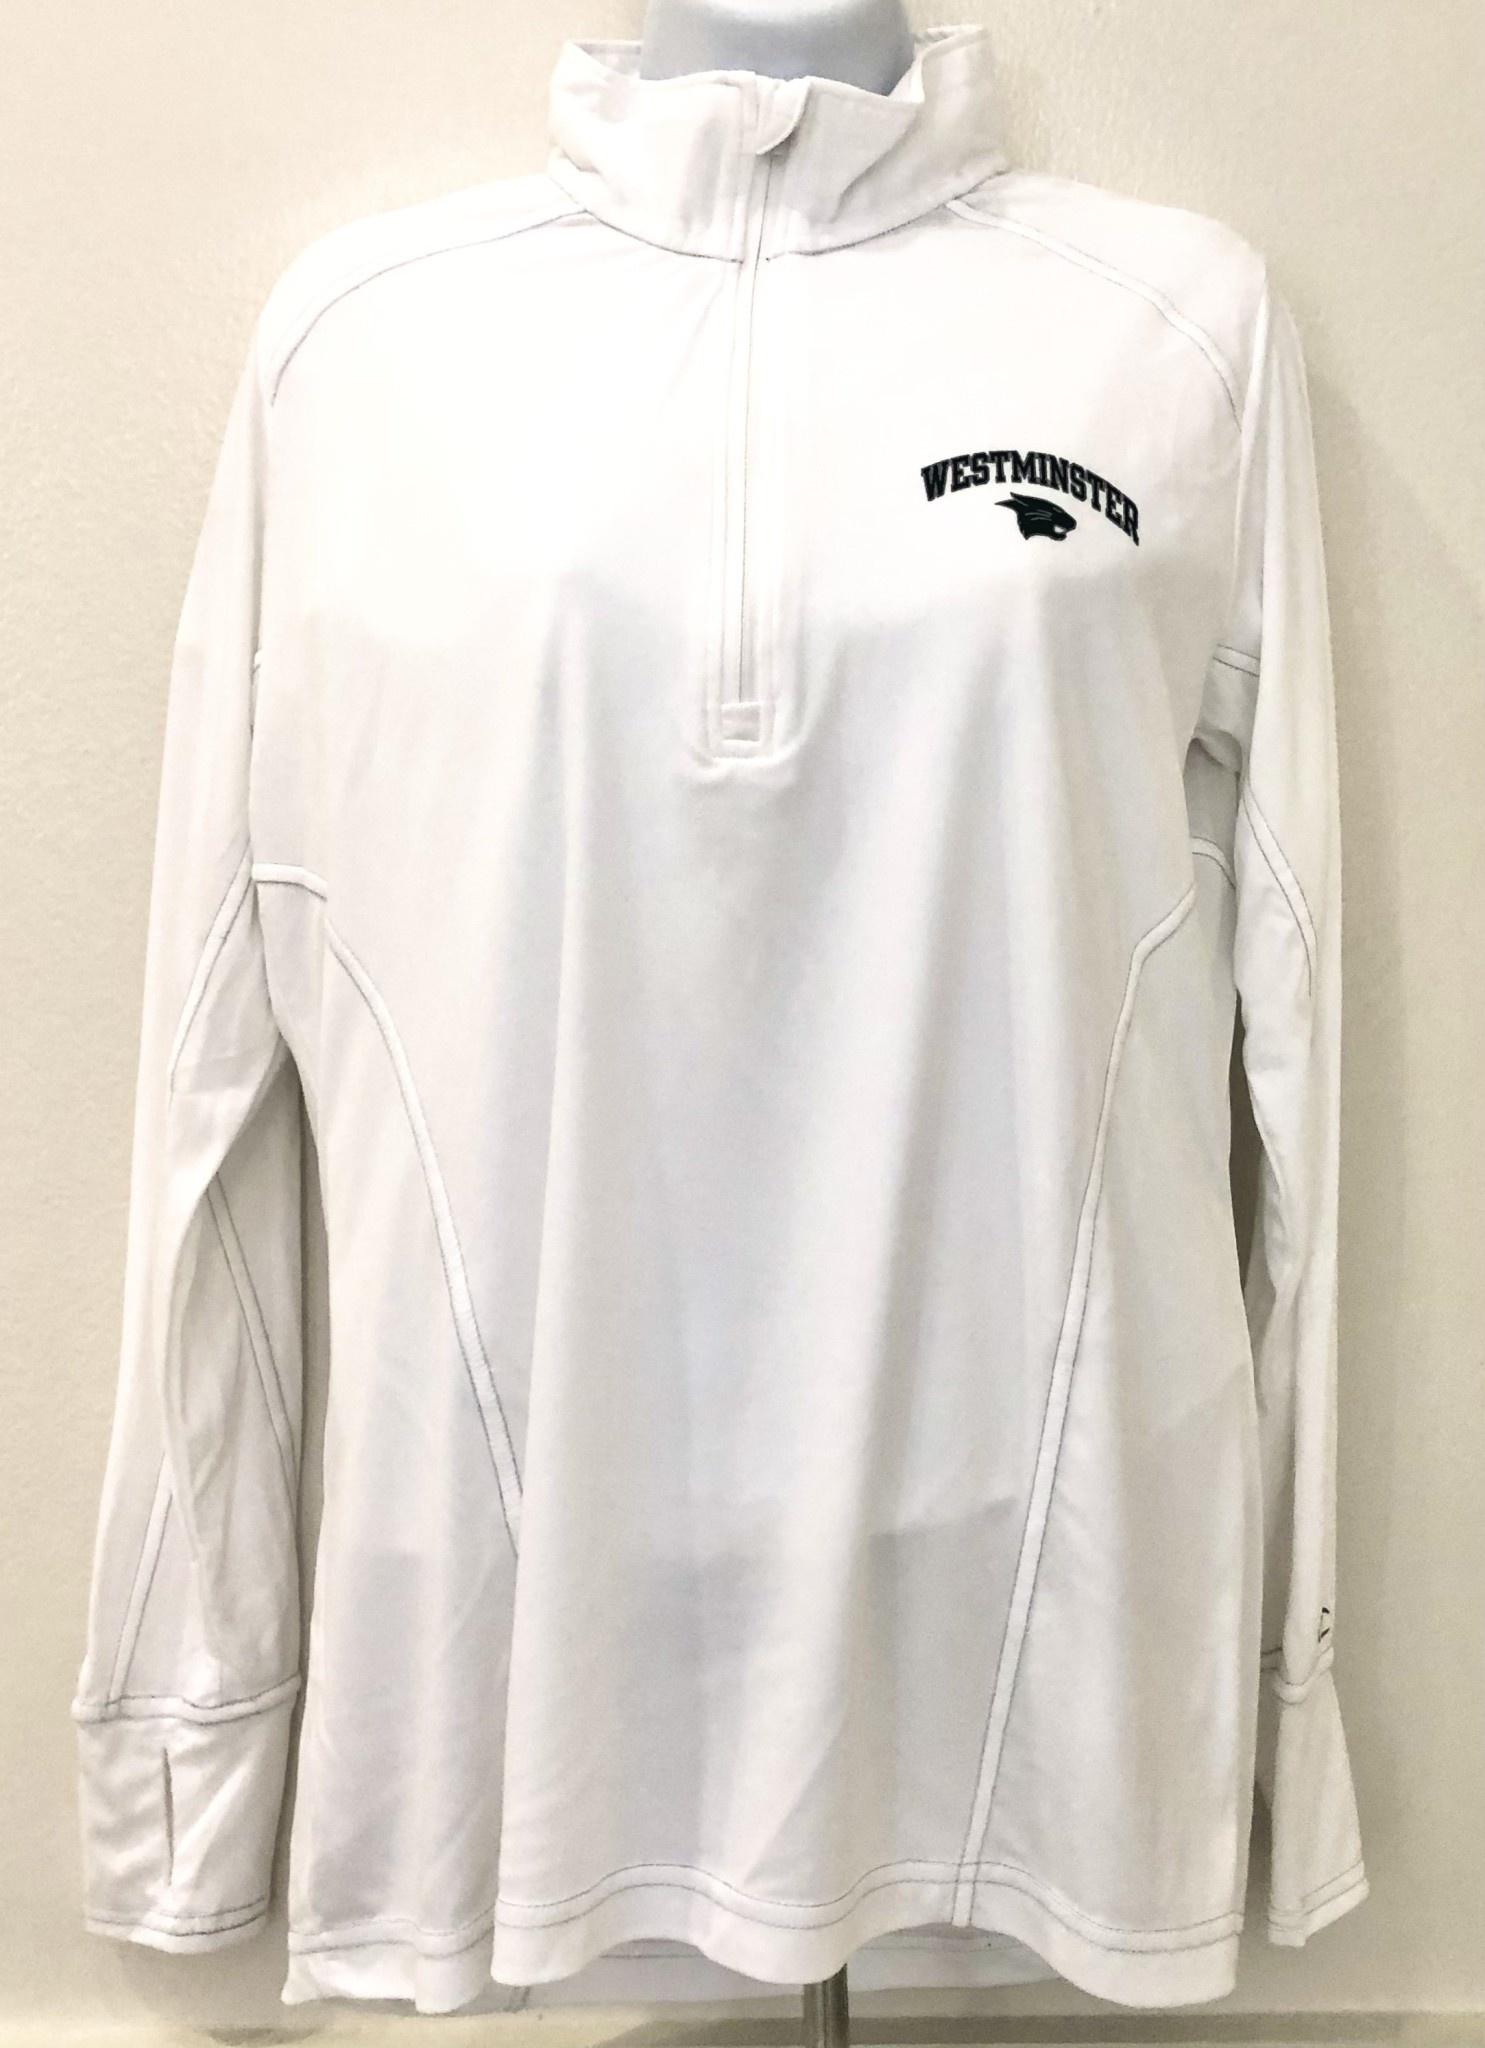 Champion Pullover: Champion Women's 1/4 zip White vapor w/West over cat